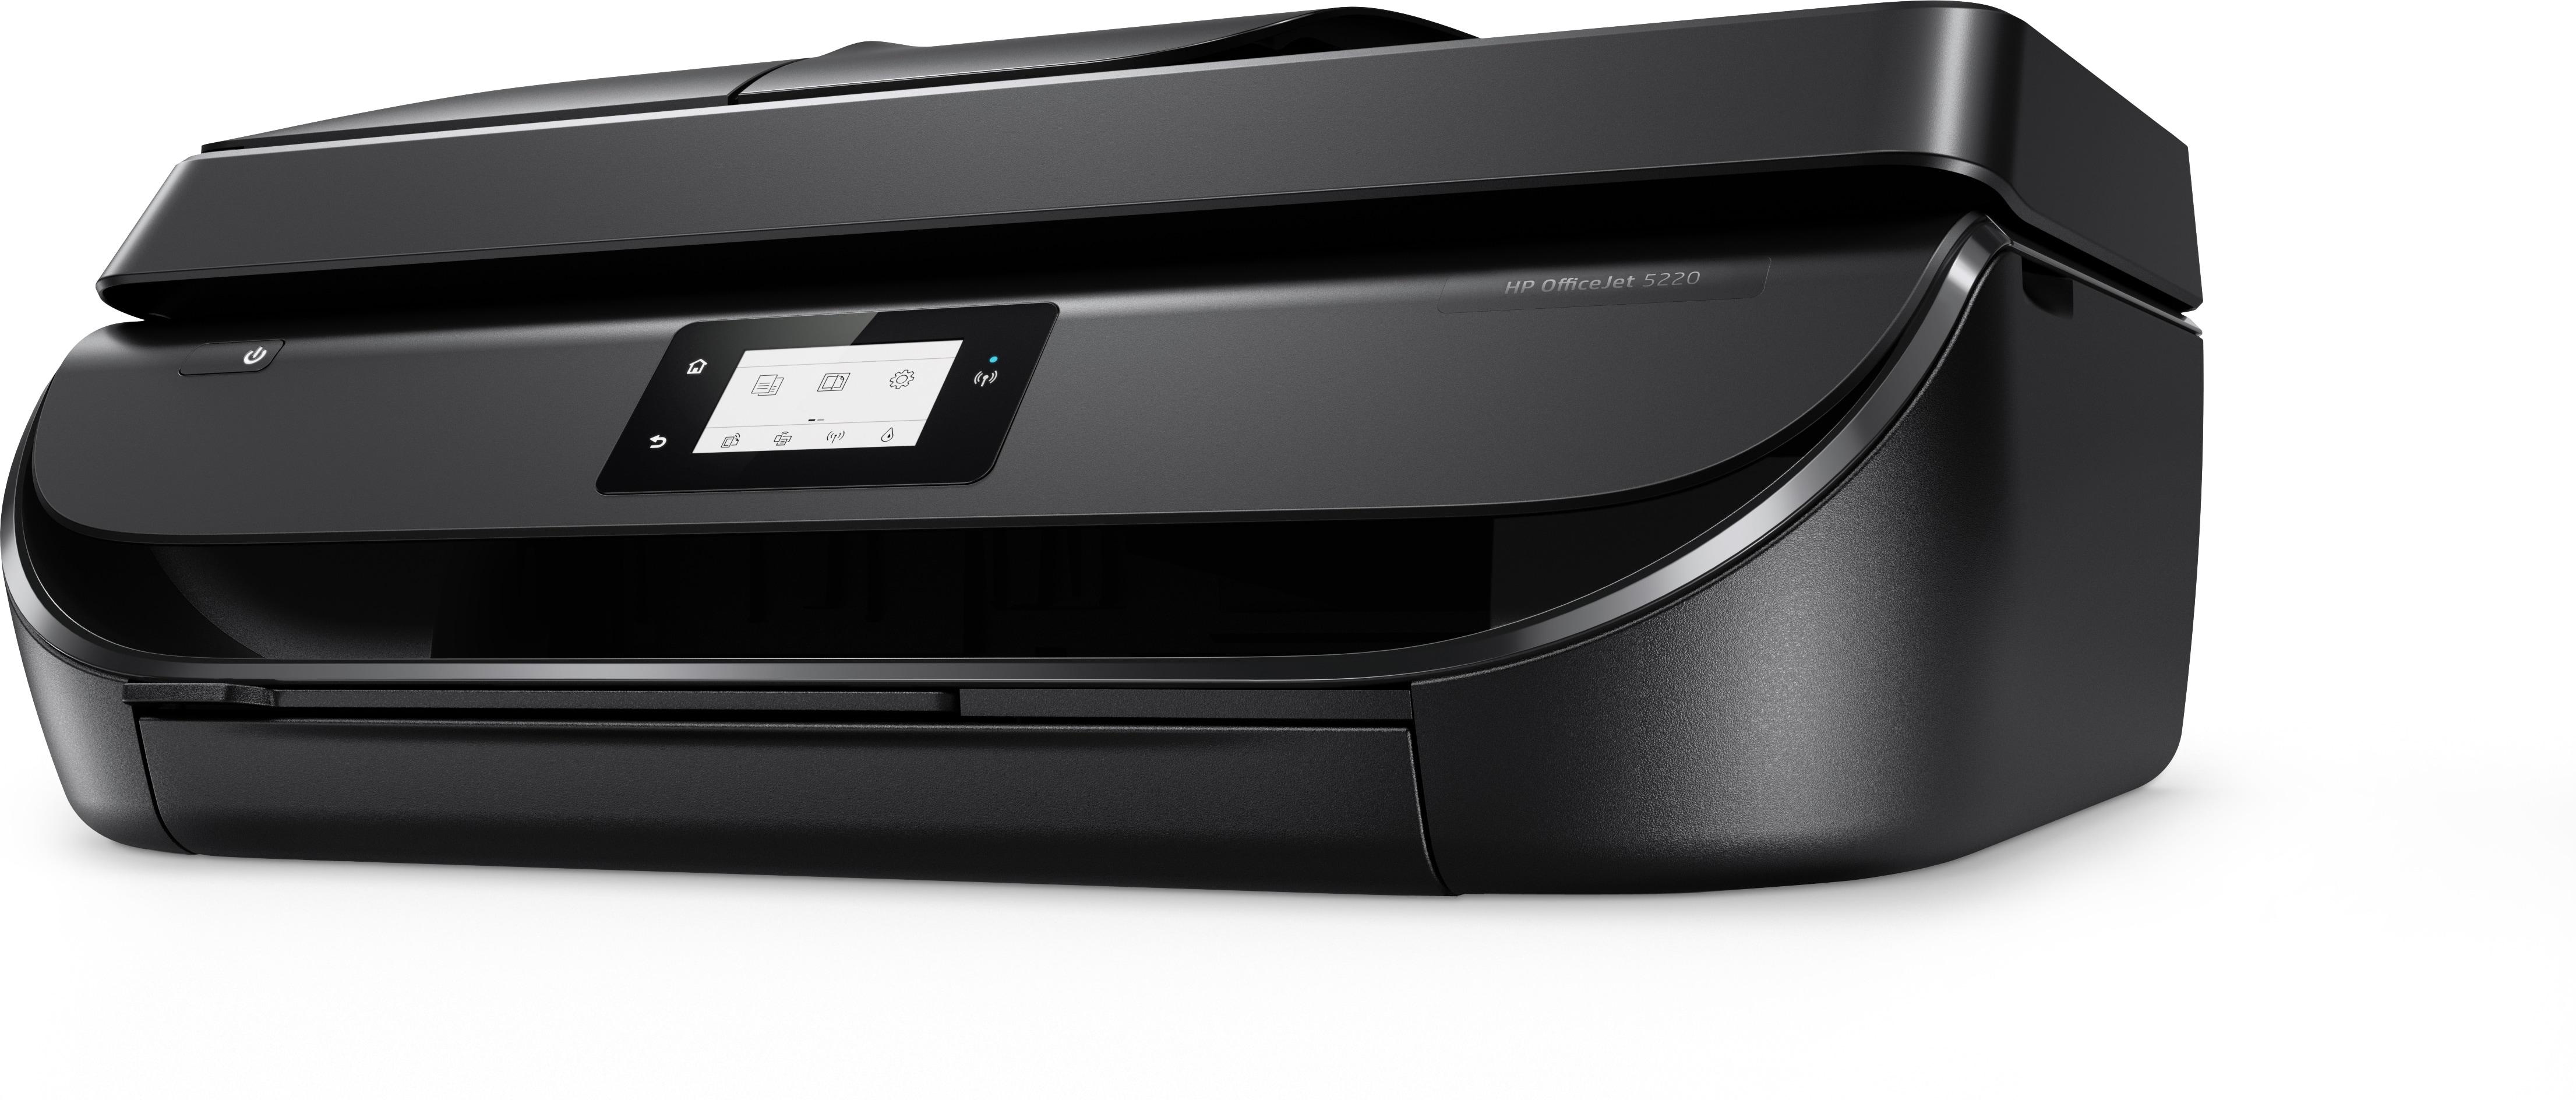 HP OfficeJet 5220 Ad inchiostro 10 ppm 4800 x 1200 DPI A4 Wi-Fi